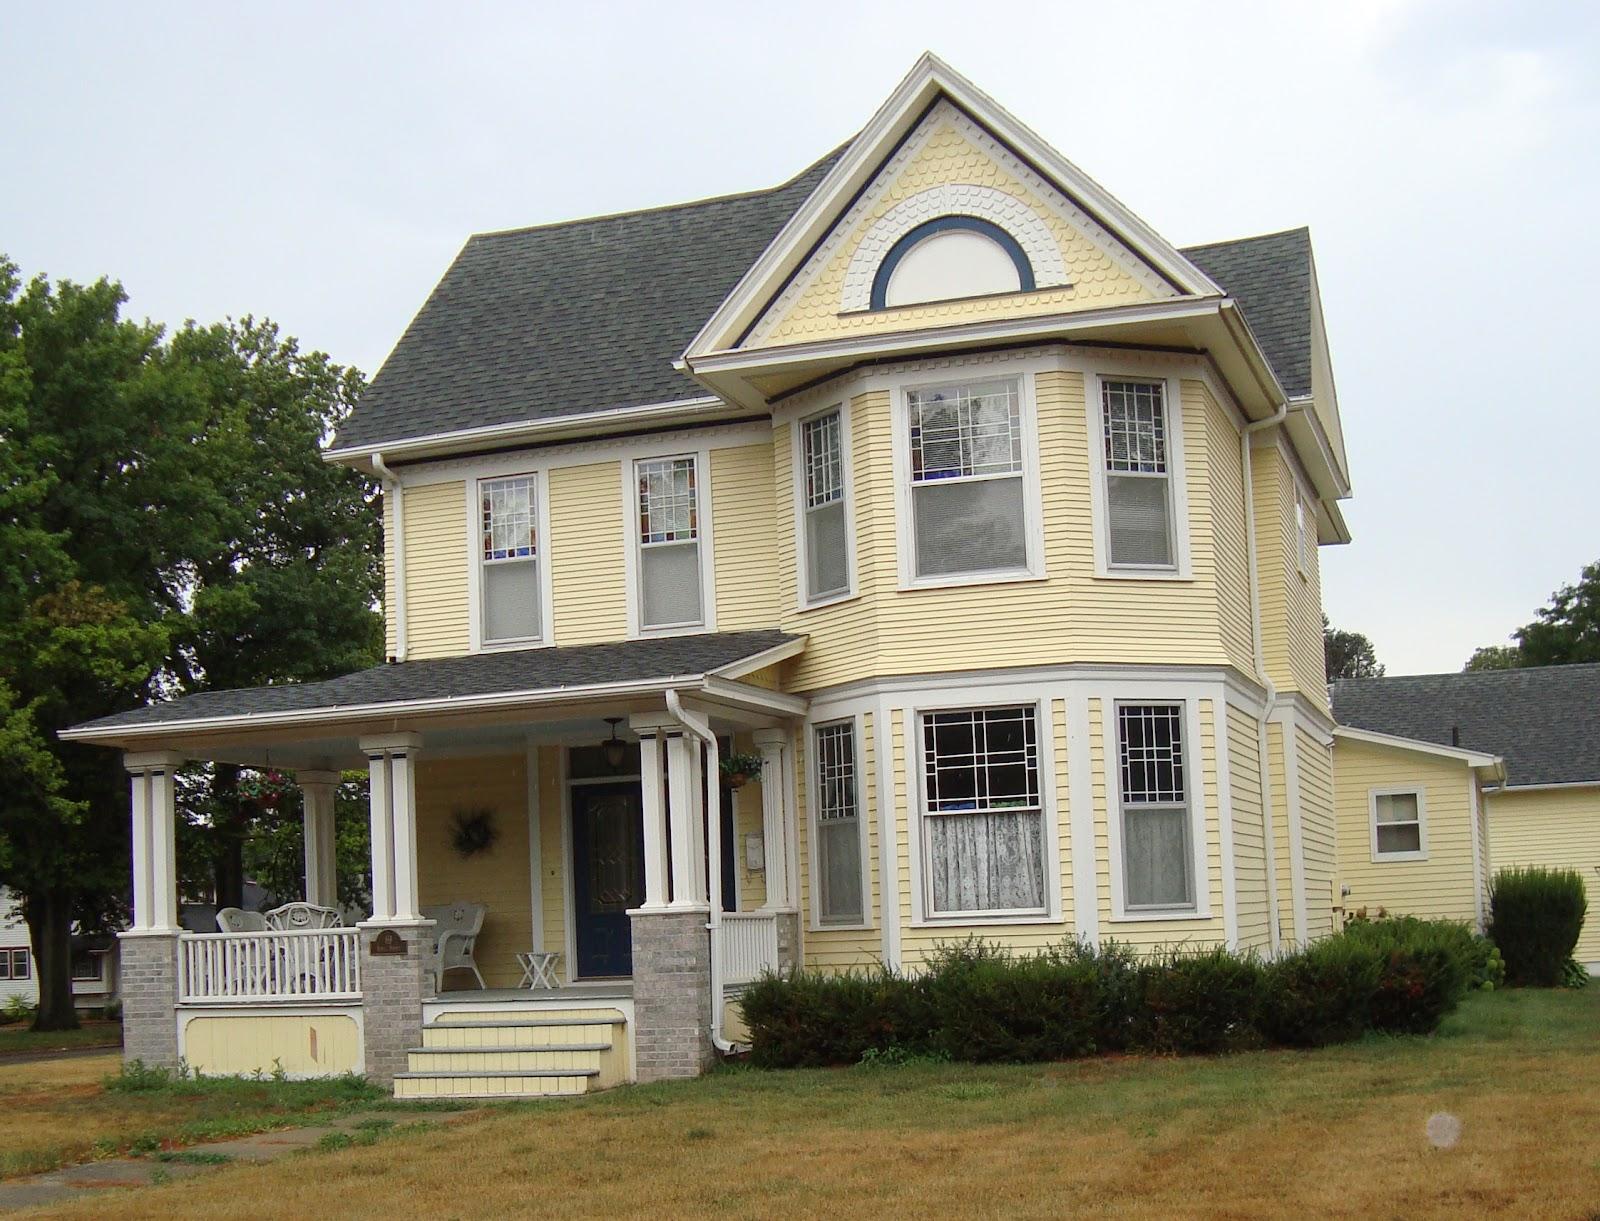 Xyz experiment yellow house w white trim - Houses with white trim ...